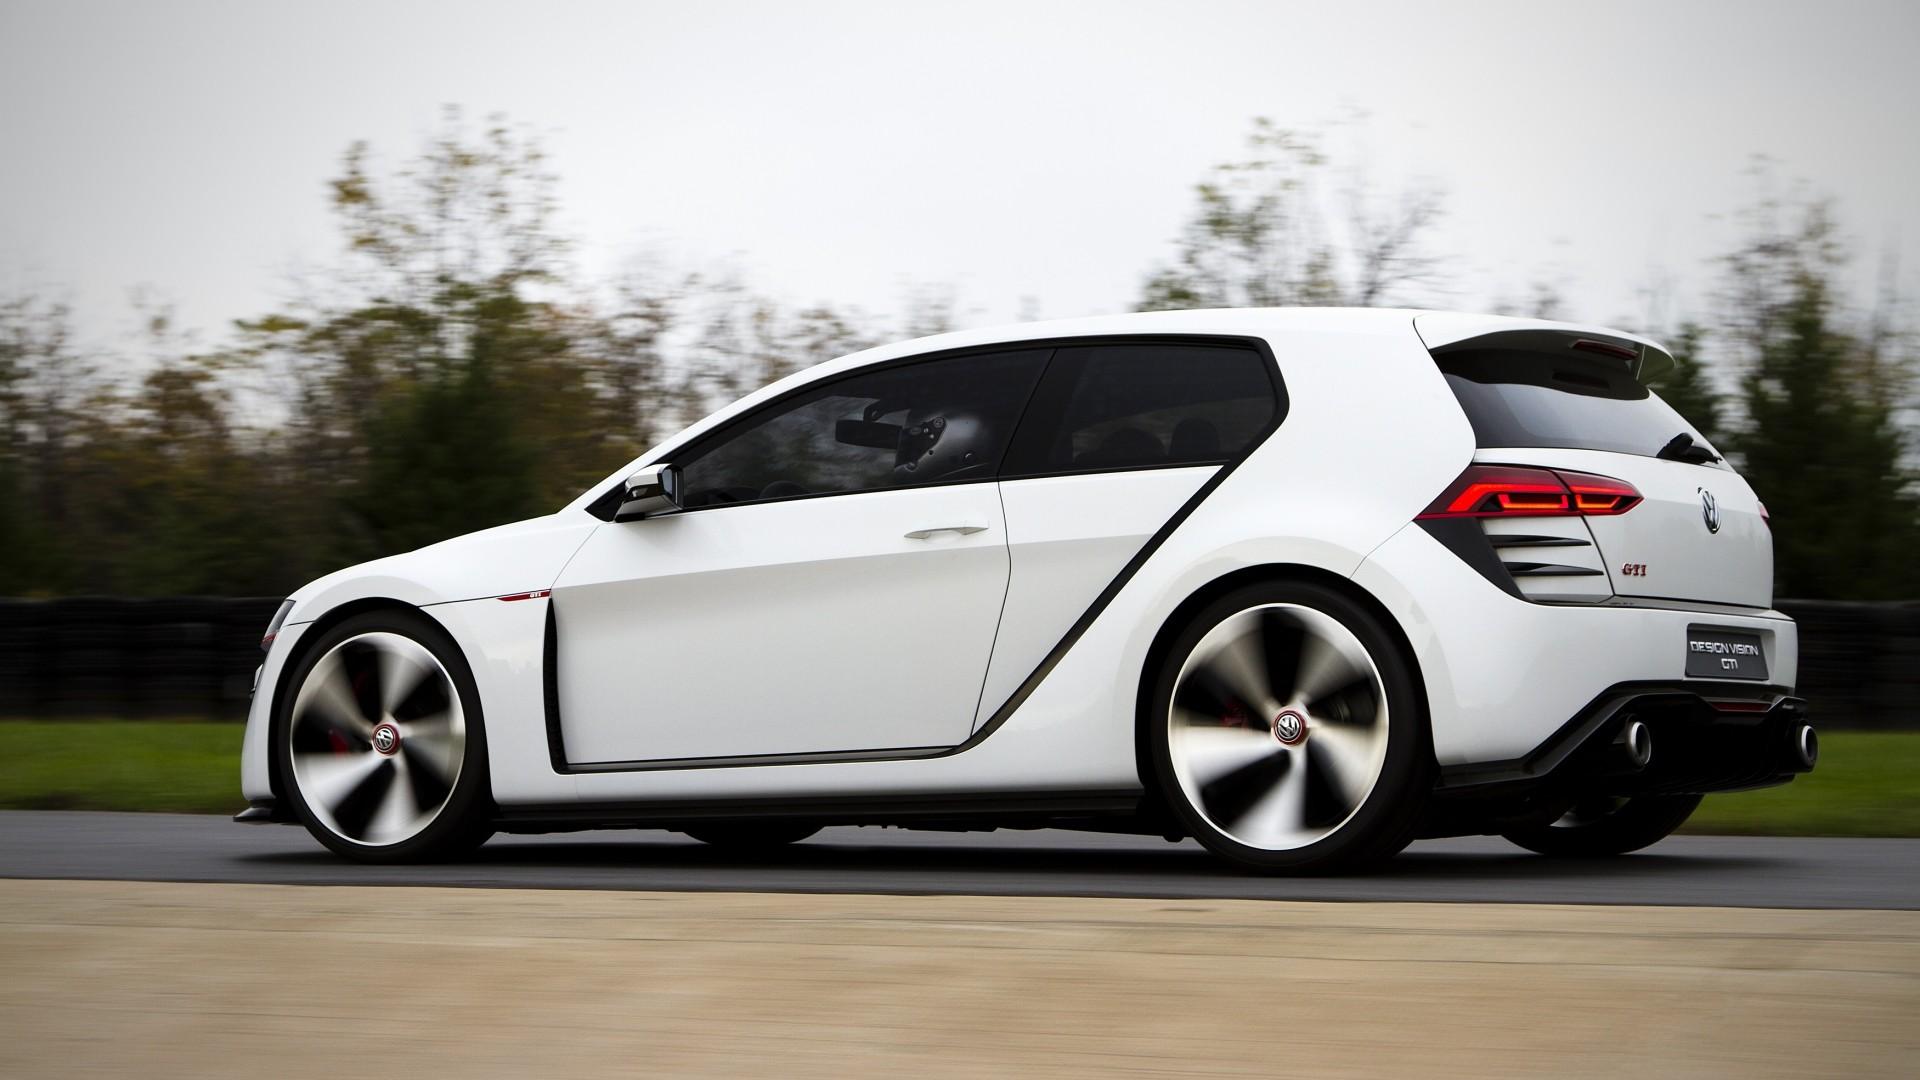 1920x1080 Volkswagen Golf GTI 2015